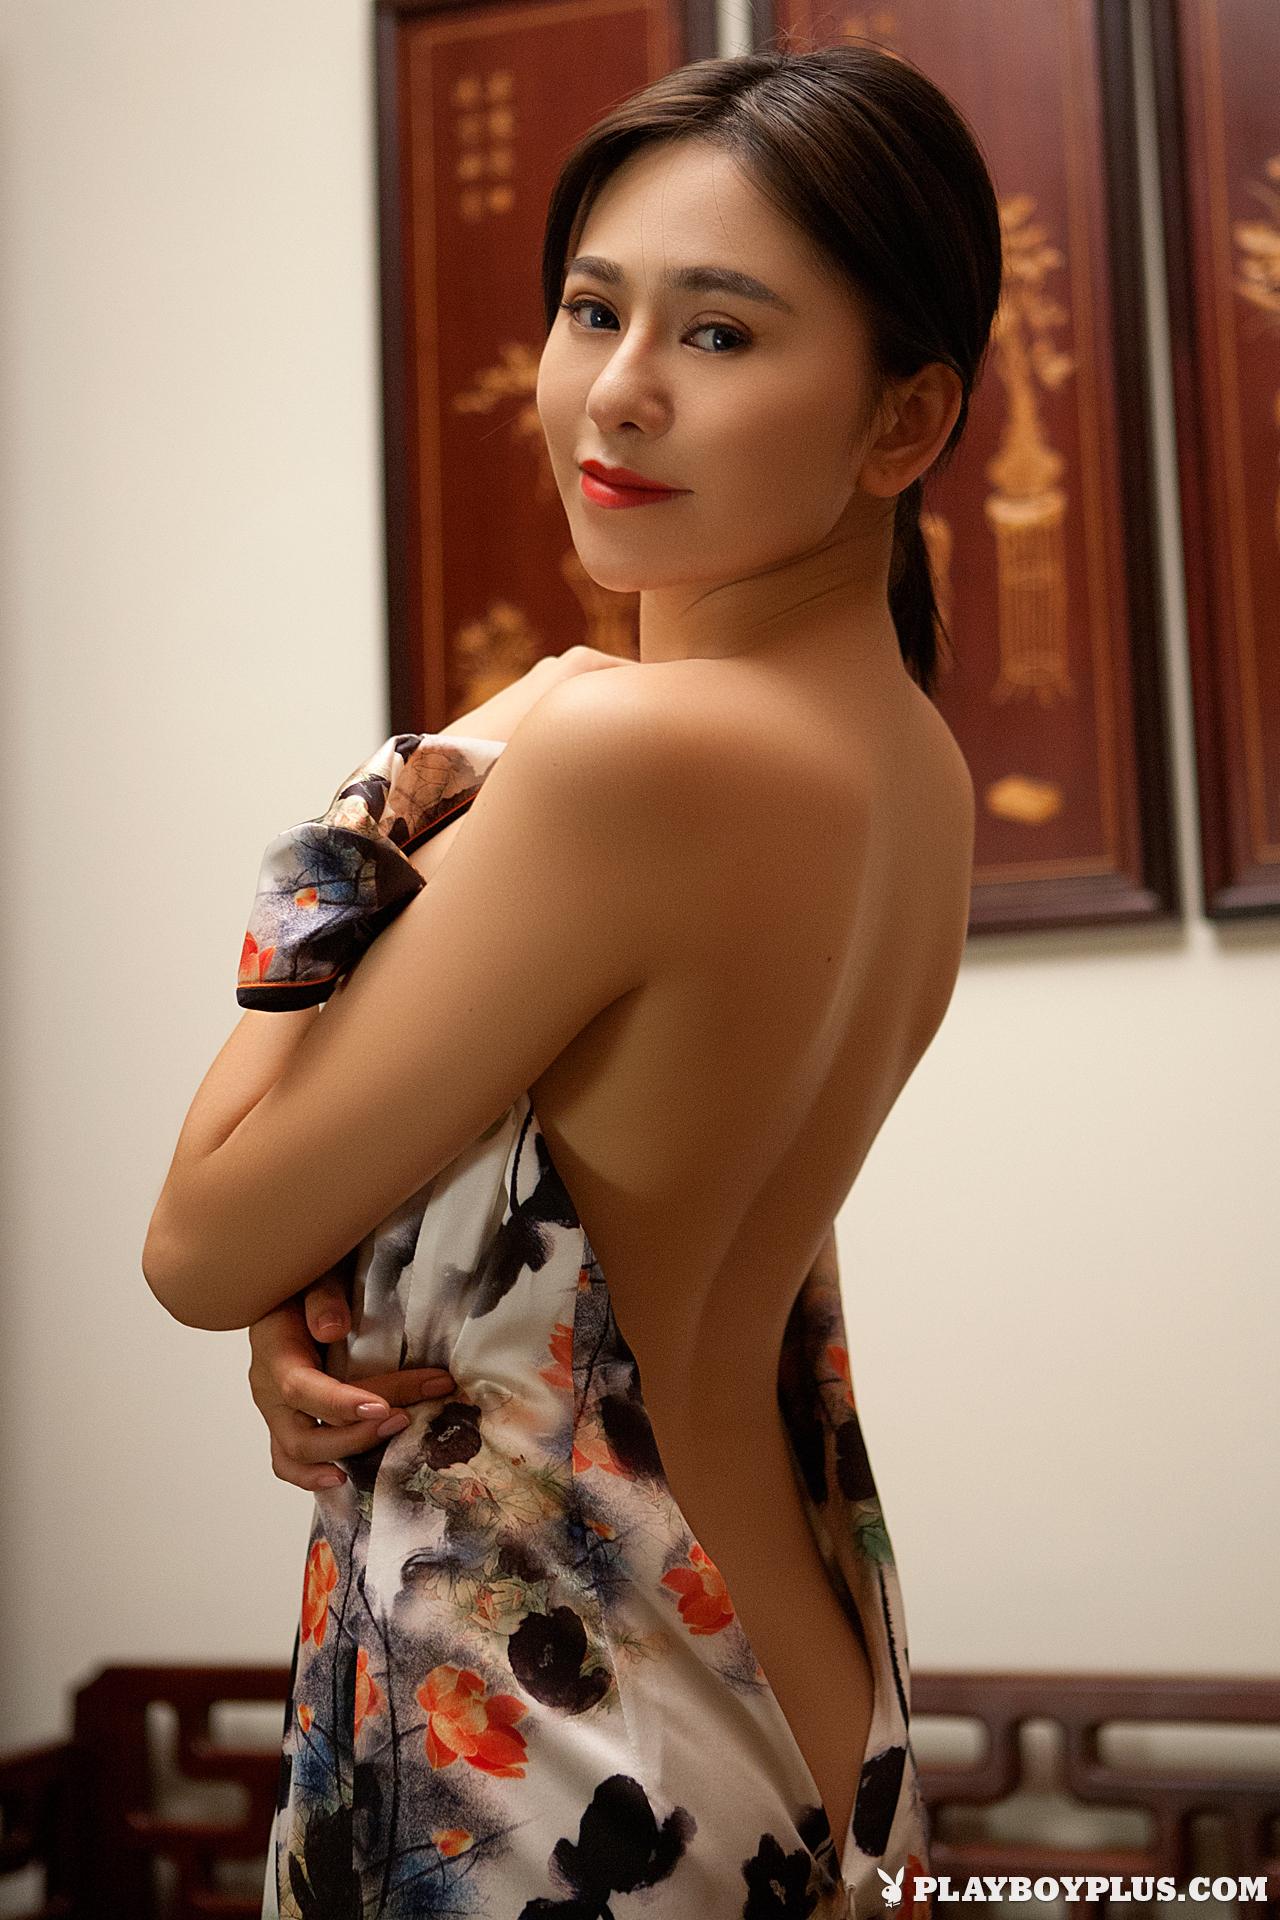 wu-muxi-nude-chinese-girl-short-dress-playboy-07